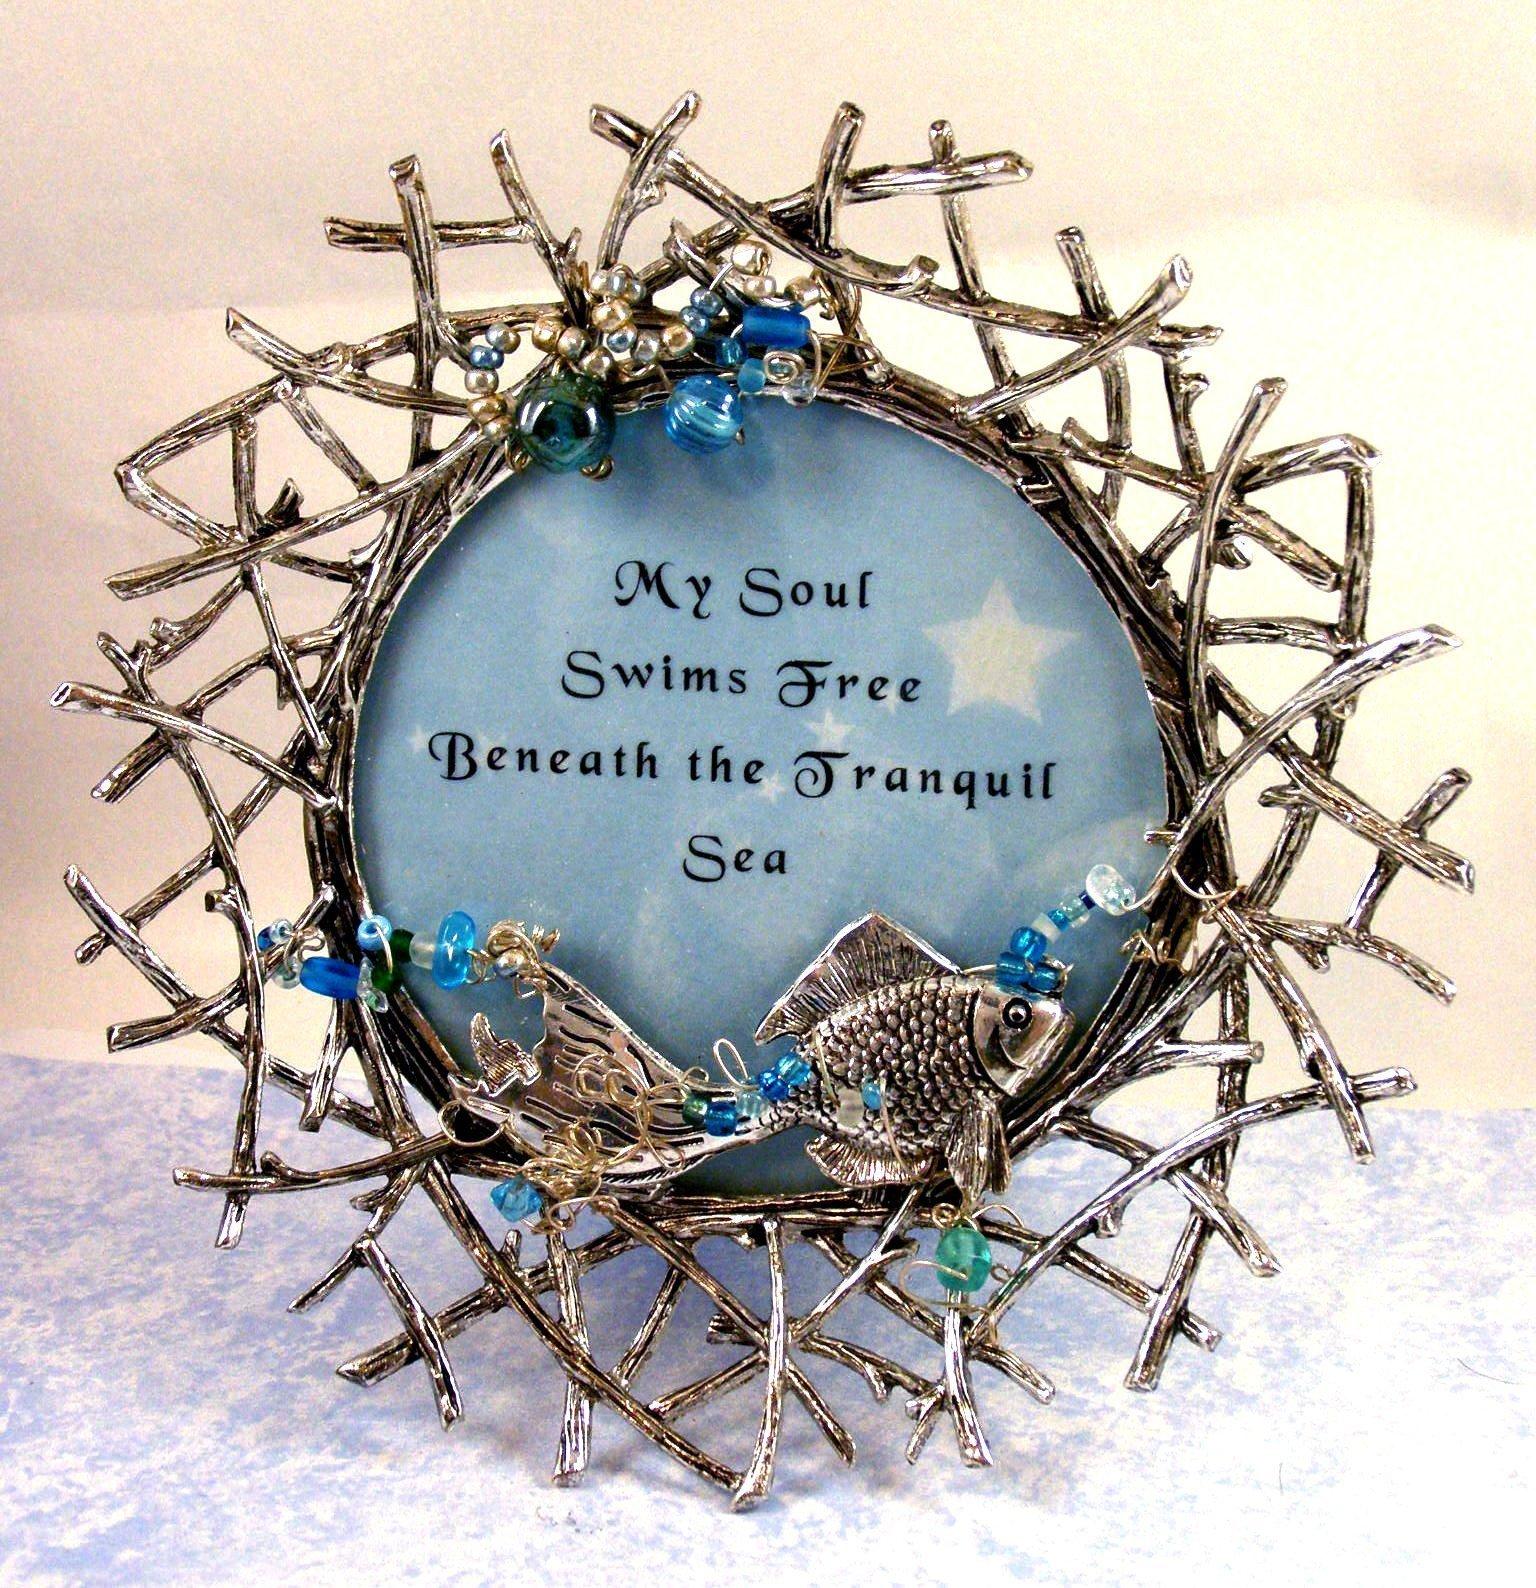 Artist Handmade Framed Beaded Inspirational FISH Verse-One of a Kind Art-Ornate Frame-''My Soul Swims Free''-Love of Ocean-Nautical